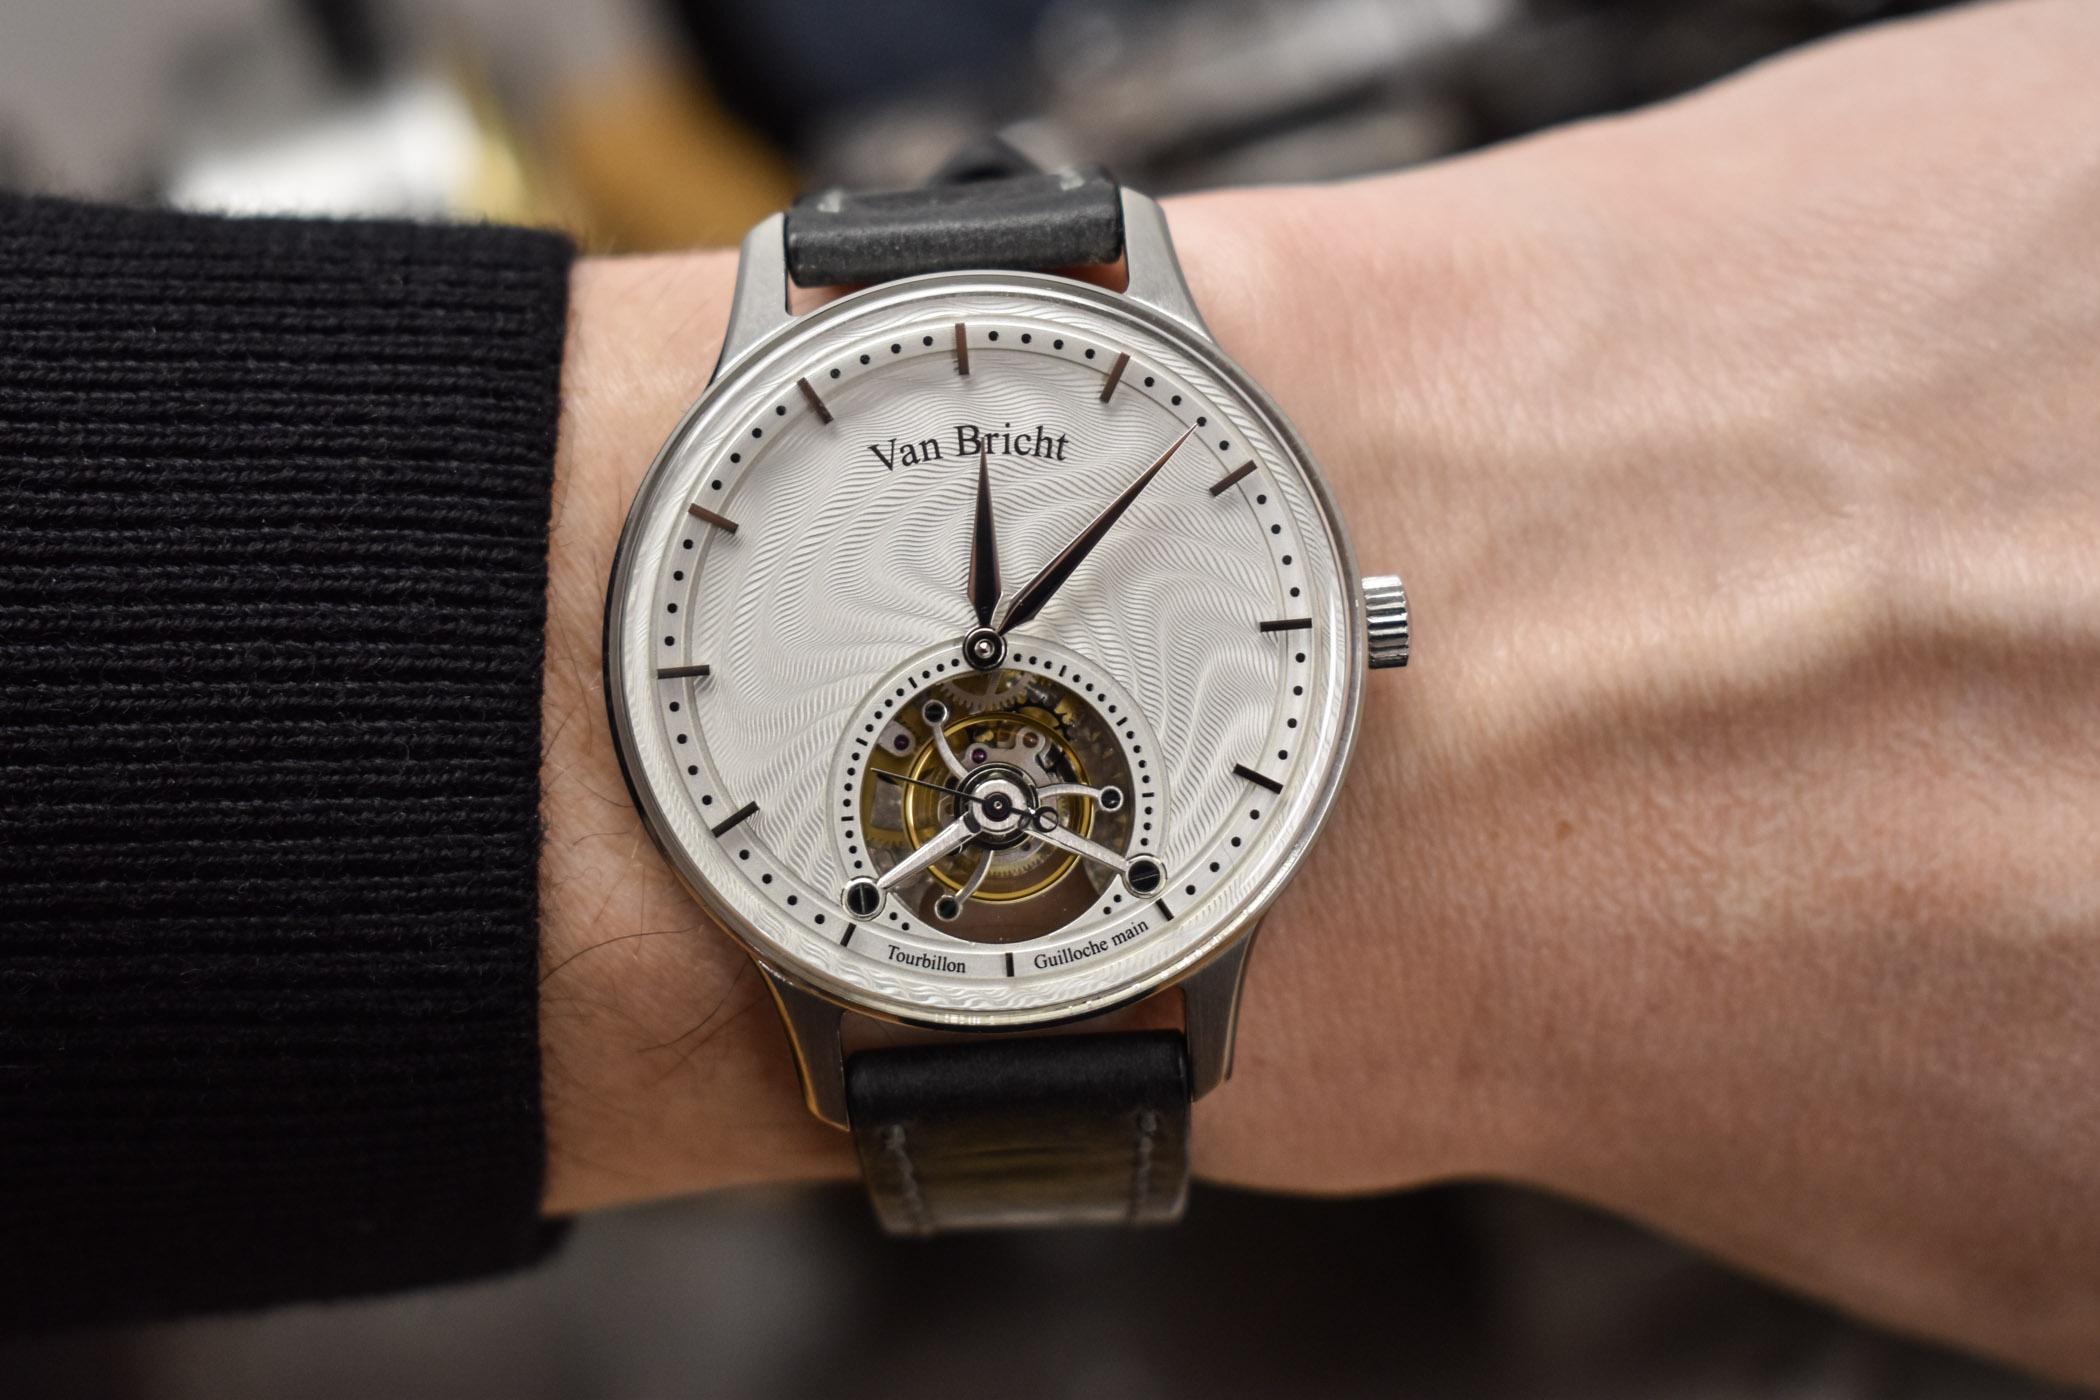 Van Bricht Old Mind Tourbillon - Independent Watchmaking Belgium